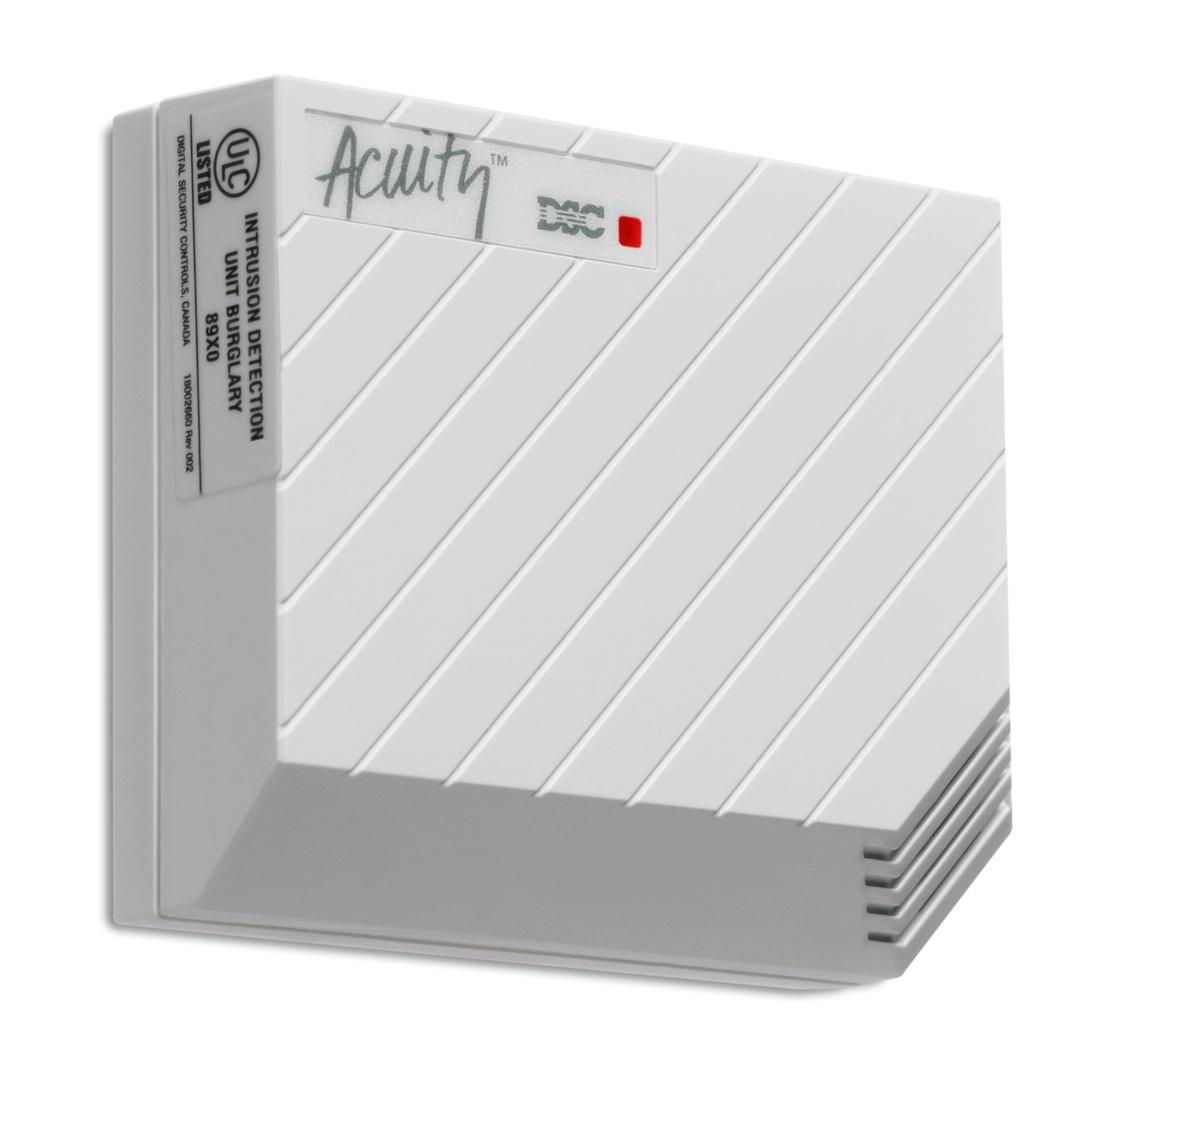 Hardwired Glass-Break Detector (Model AC-100)